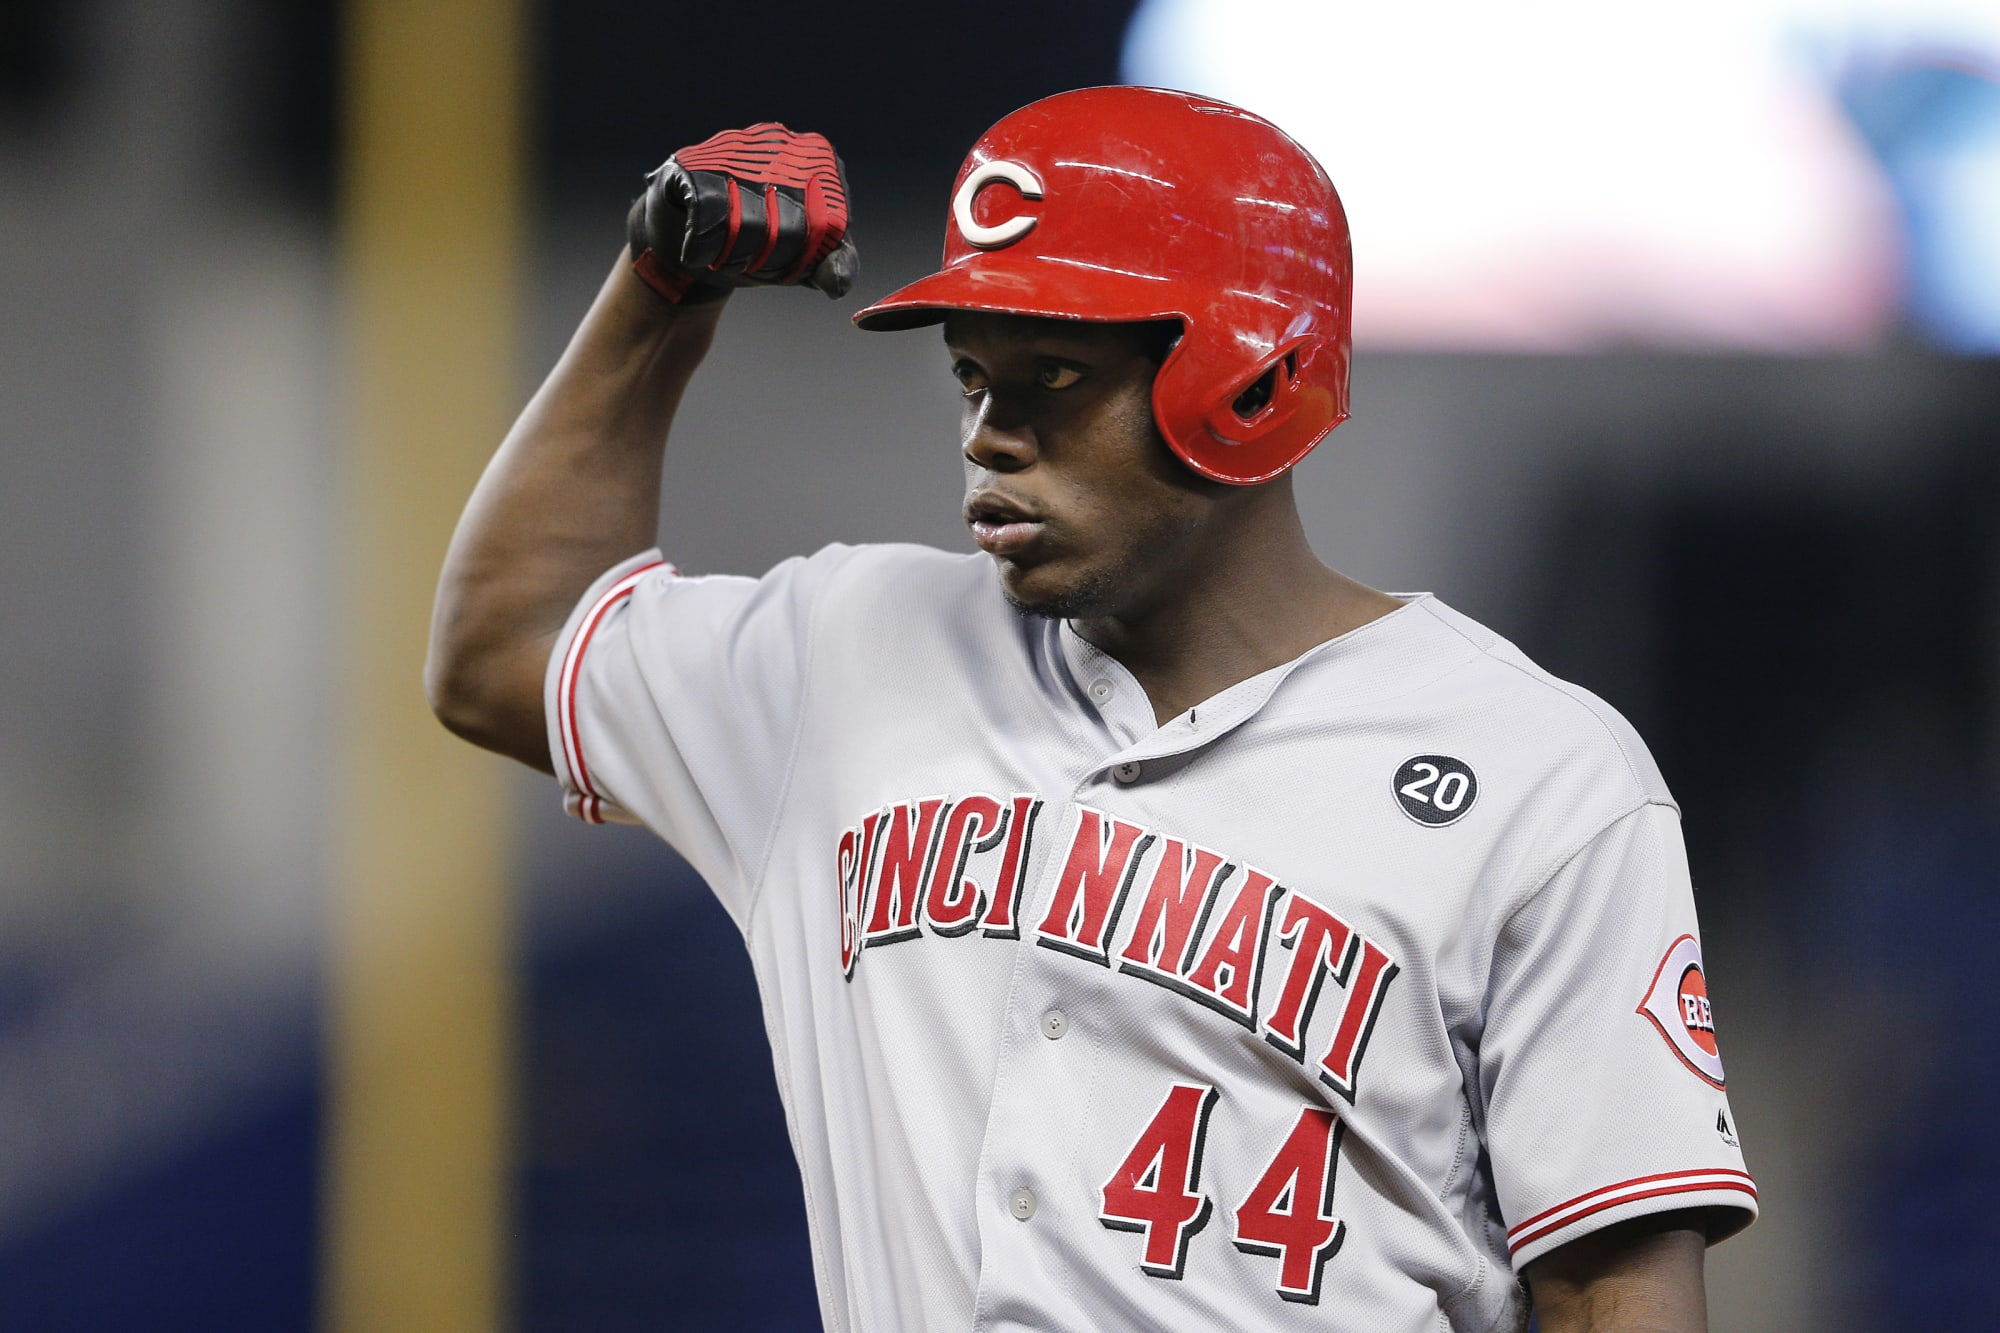 Cincinnati Reds: Aristides Aquino gearing up for the 2020 season